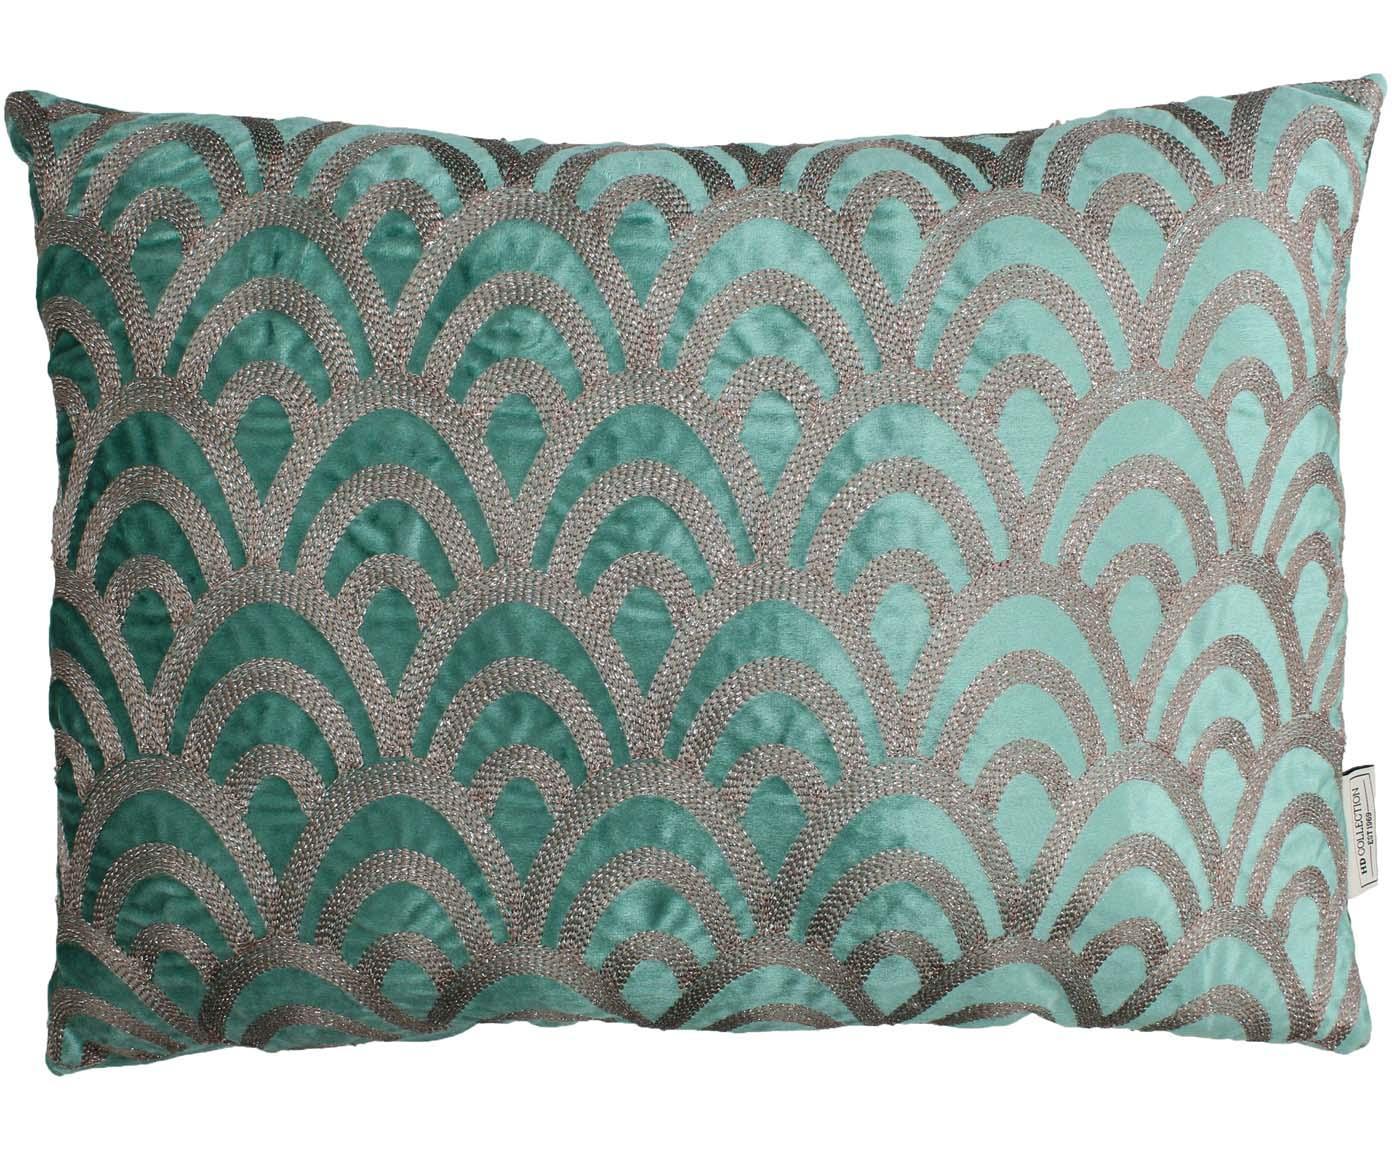 Cuscino con imbottitura in velluto Trole, Velluto, Verde, argentato, Larg. 40 x Lung. 60 cm